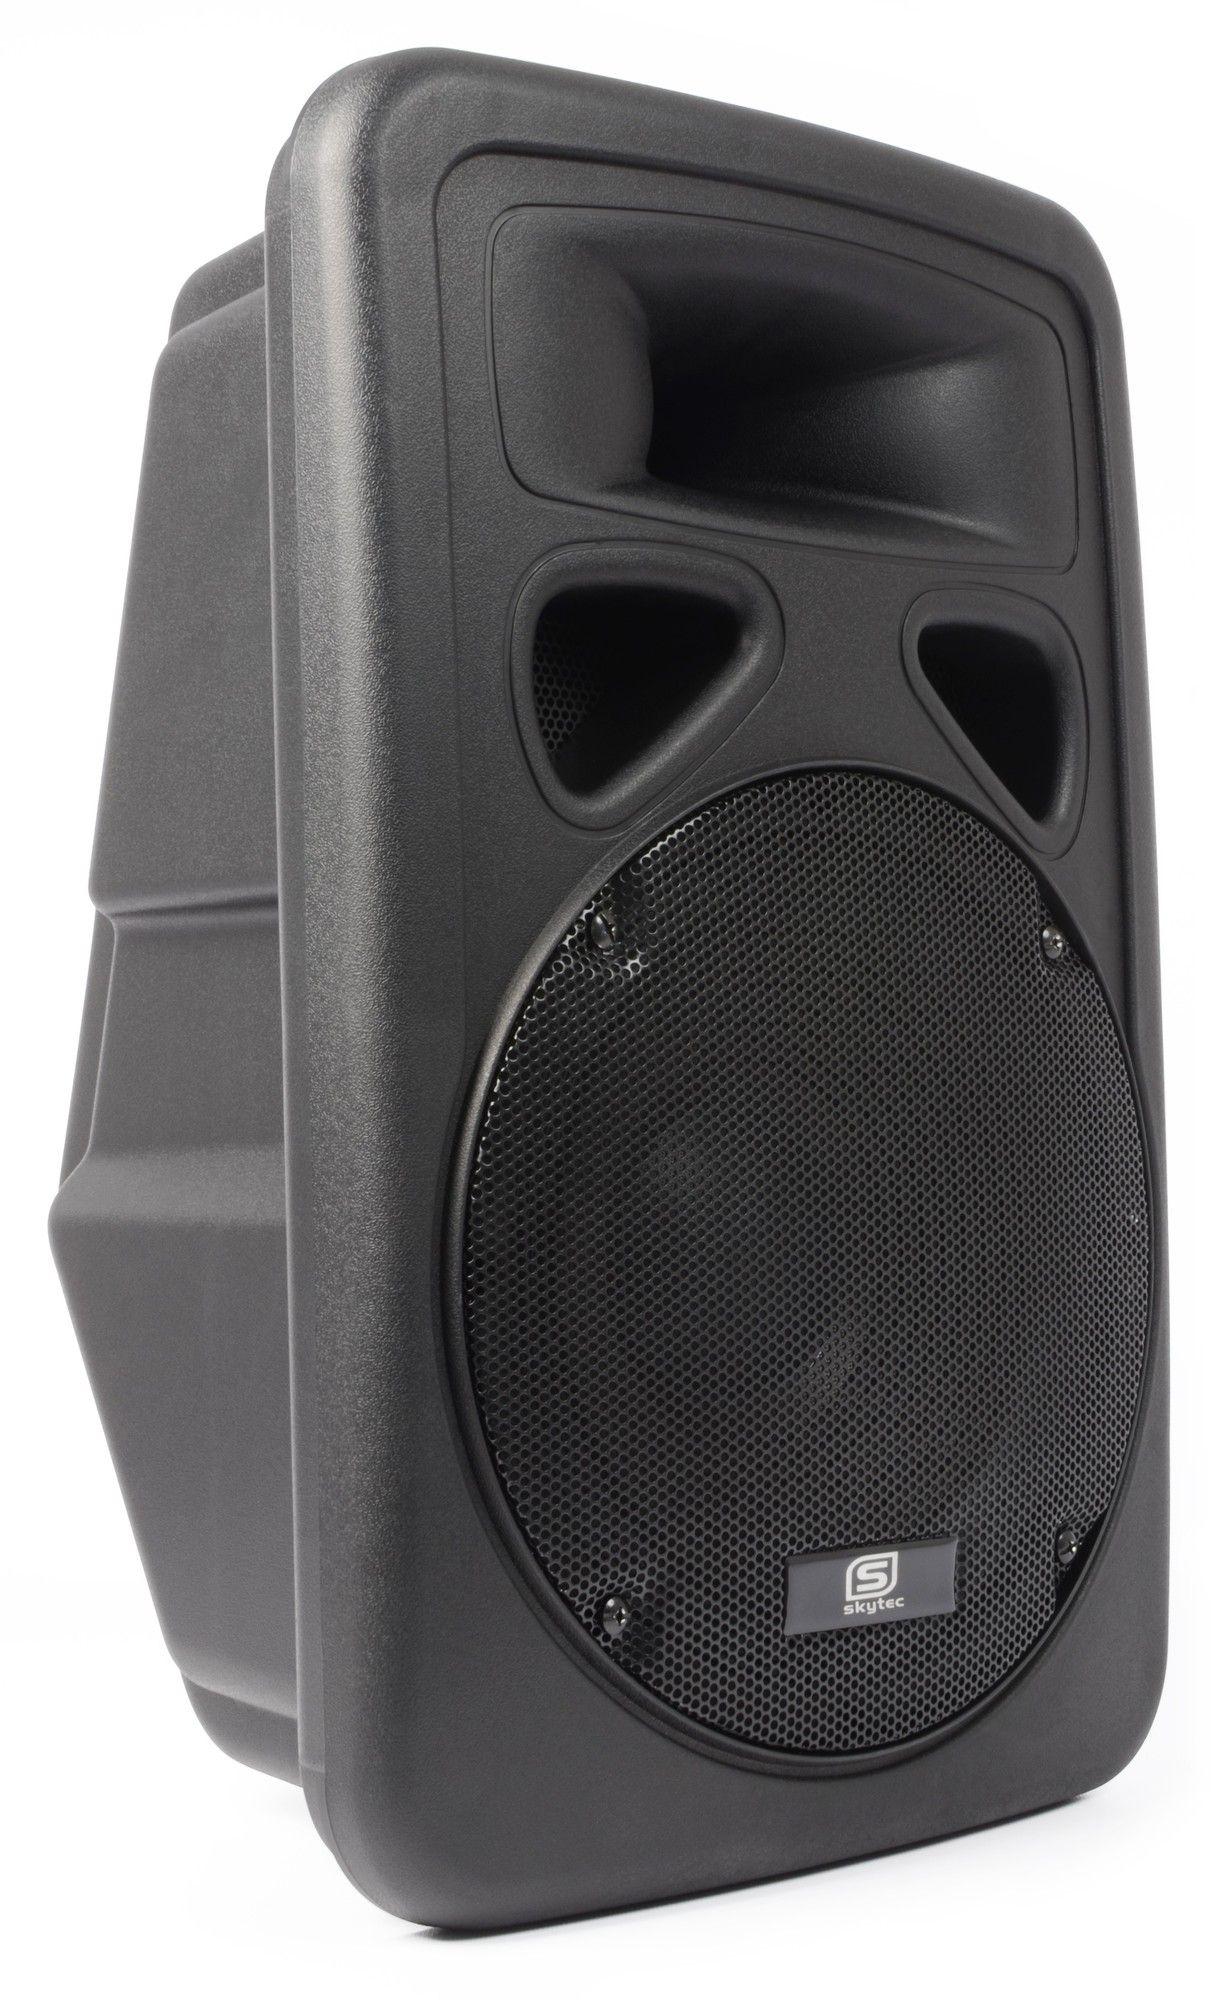 "Afbeelding van 2e keus - SkyTec SP1200A ABS Actieve PA Luidspreker Box 12"" 600W..."